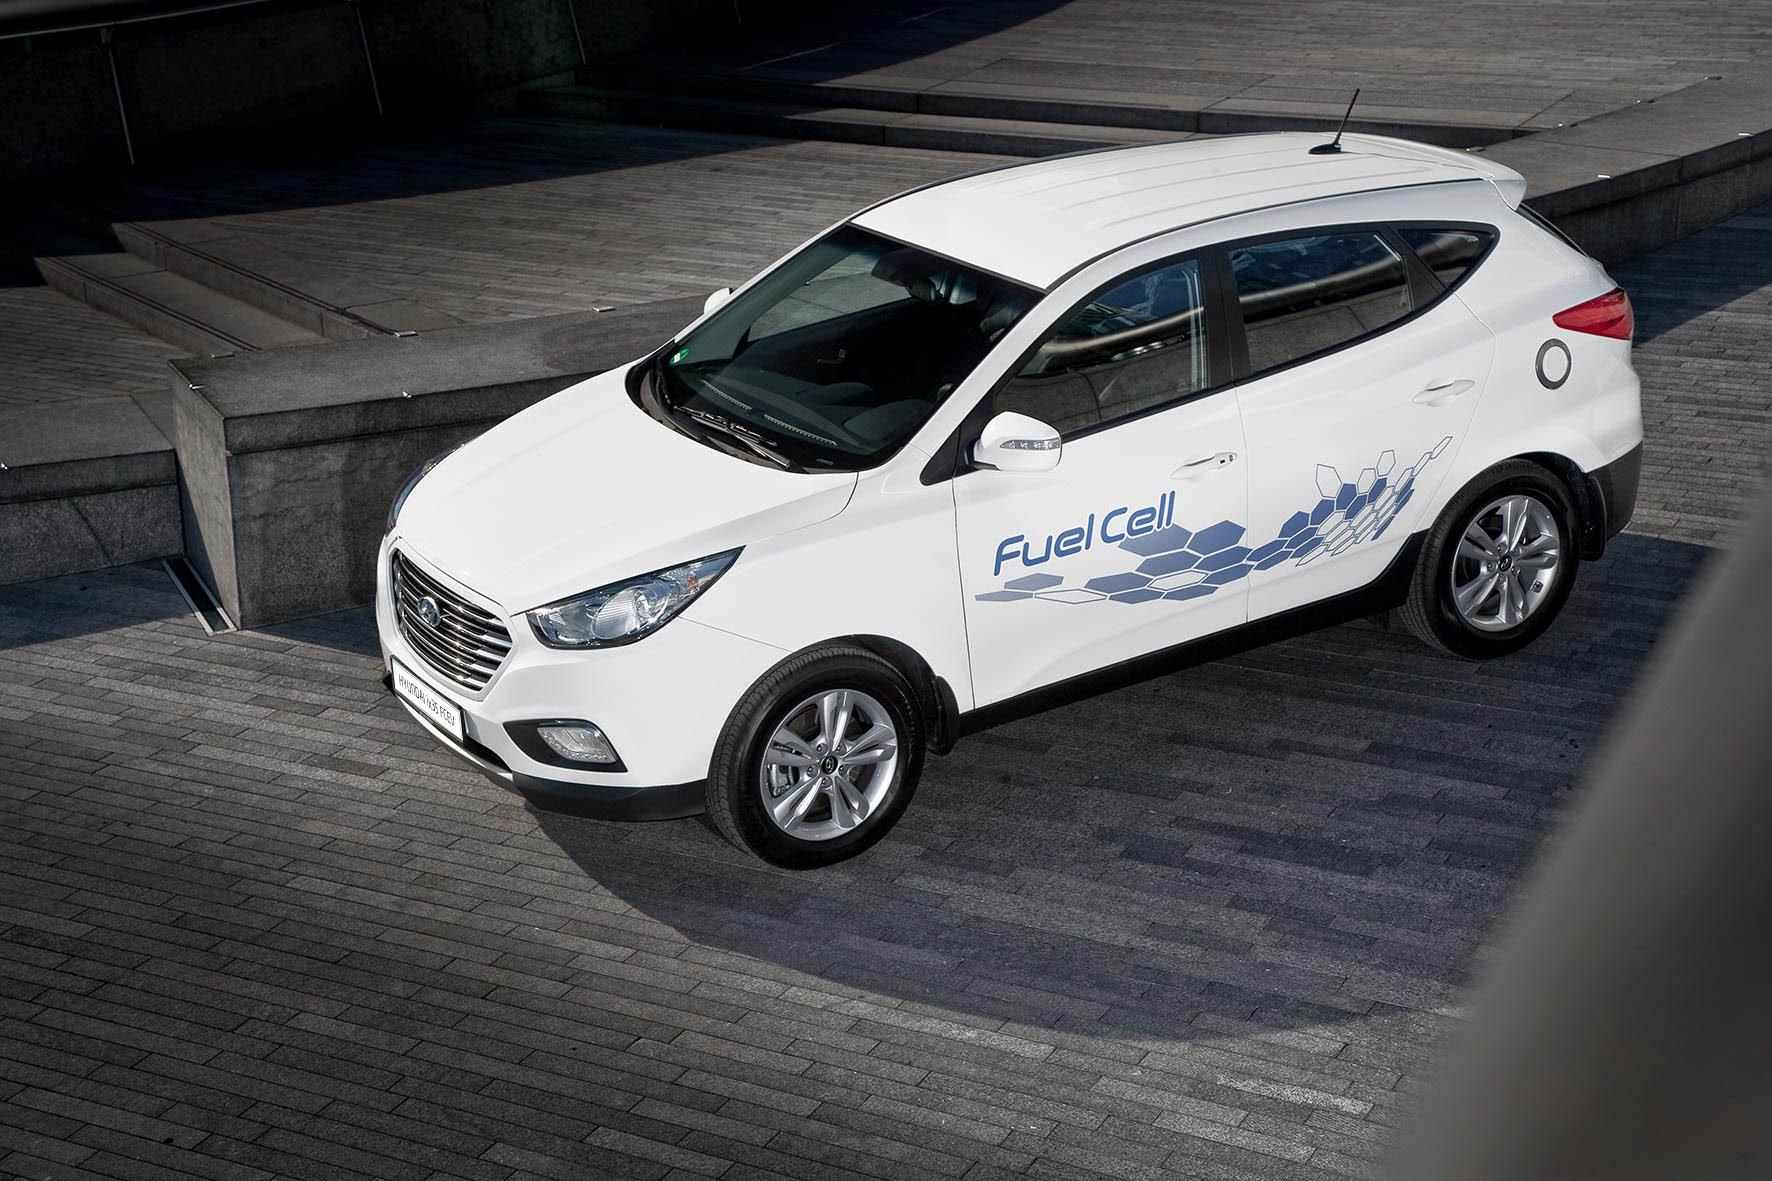 Hyundai ix35 waterstof waterstofauto brandstofcel FCEV